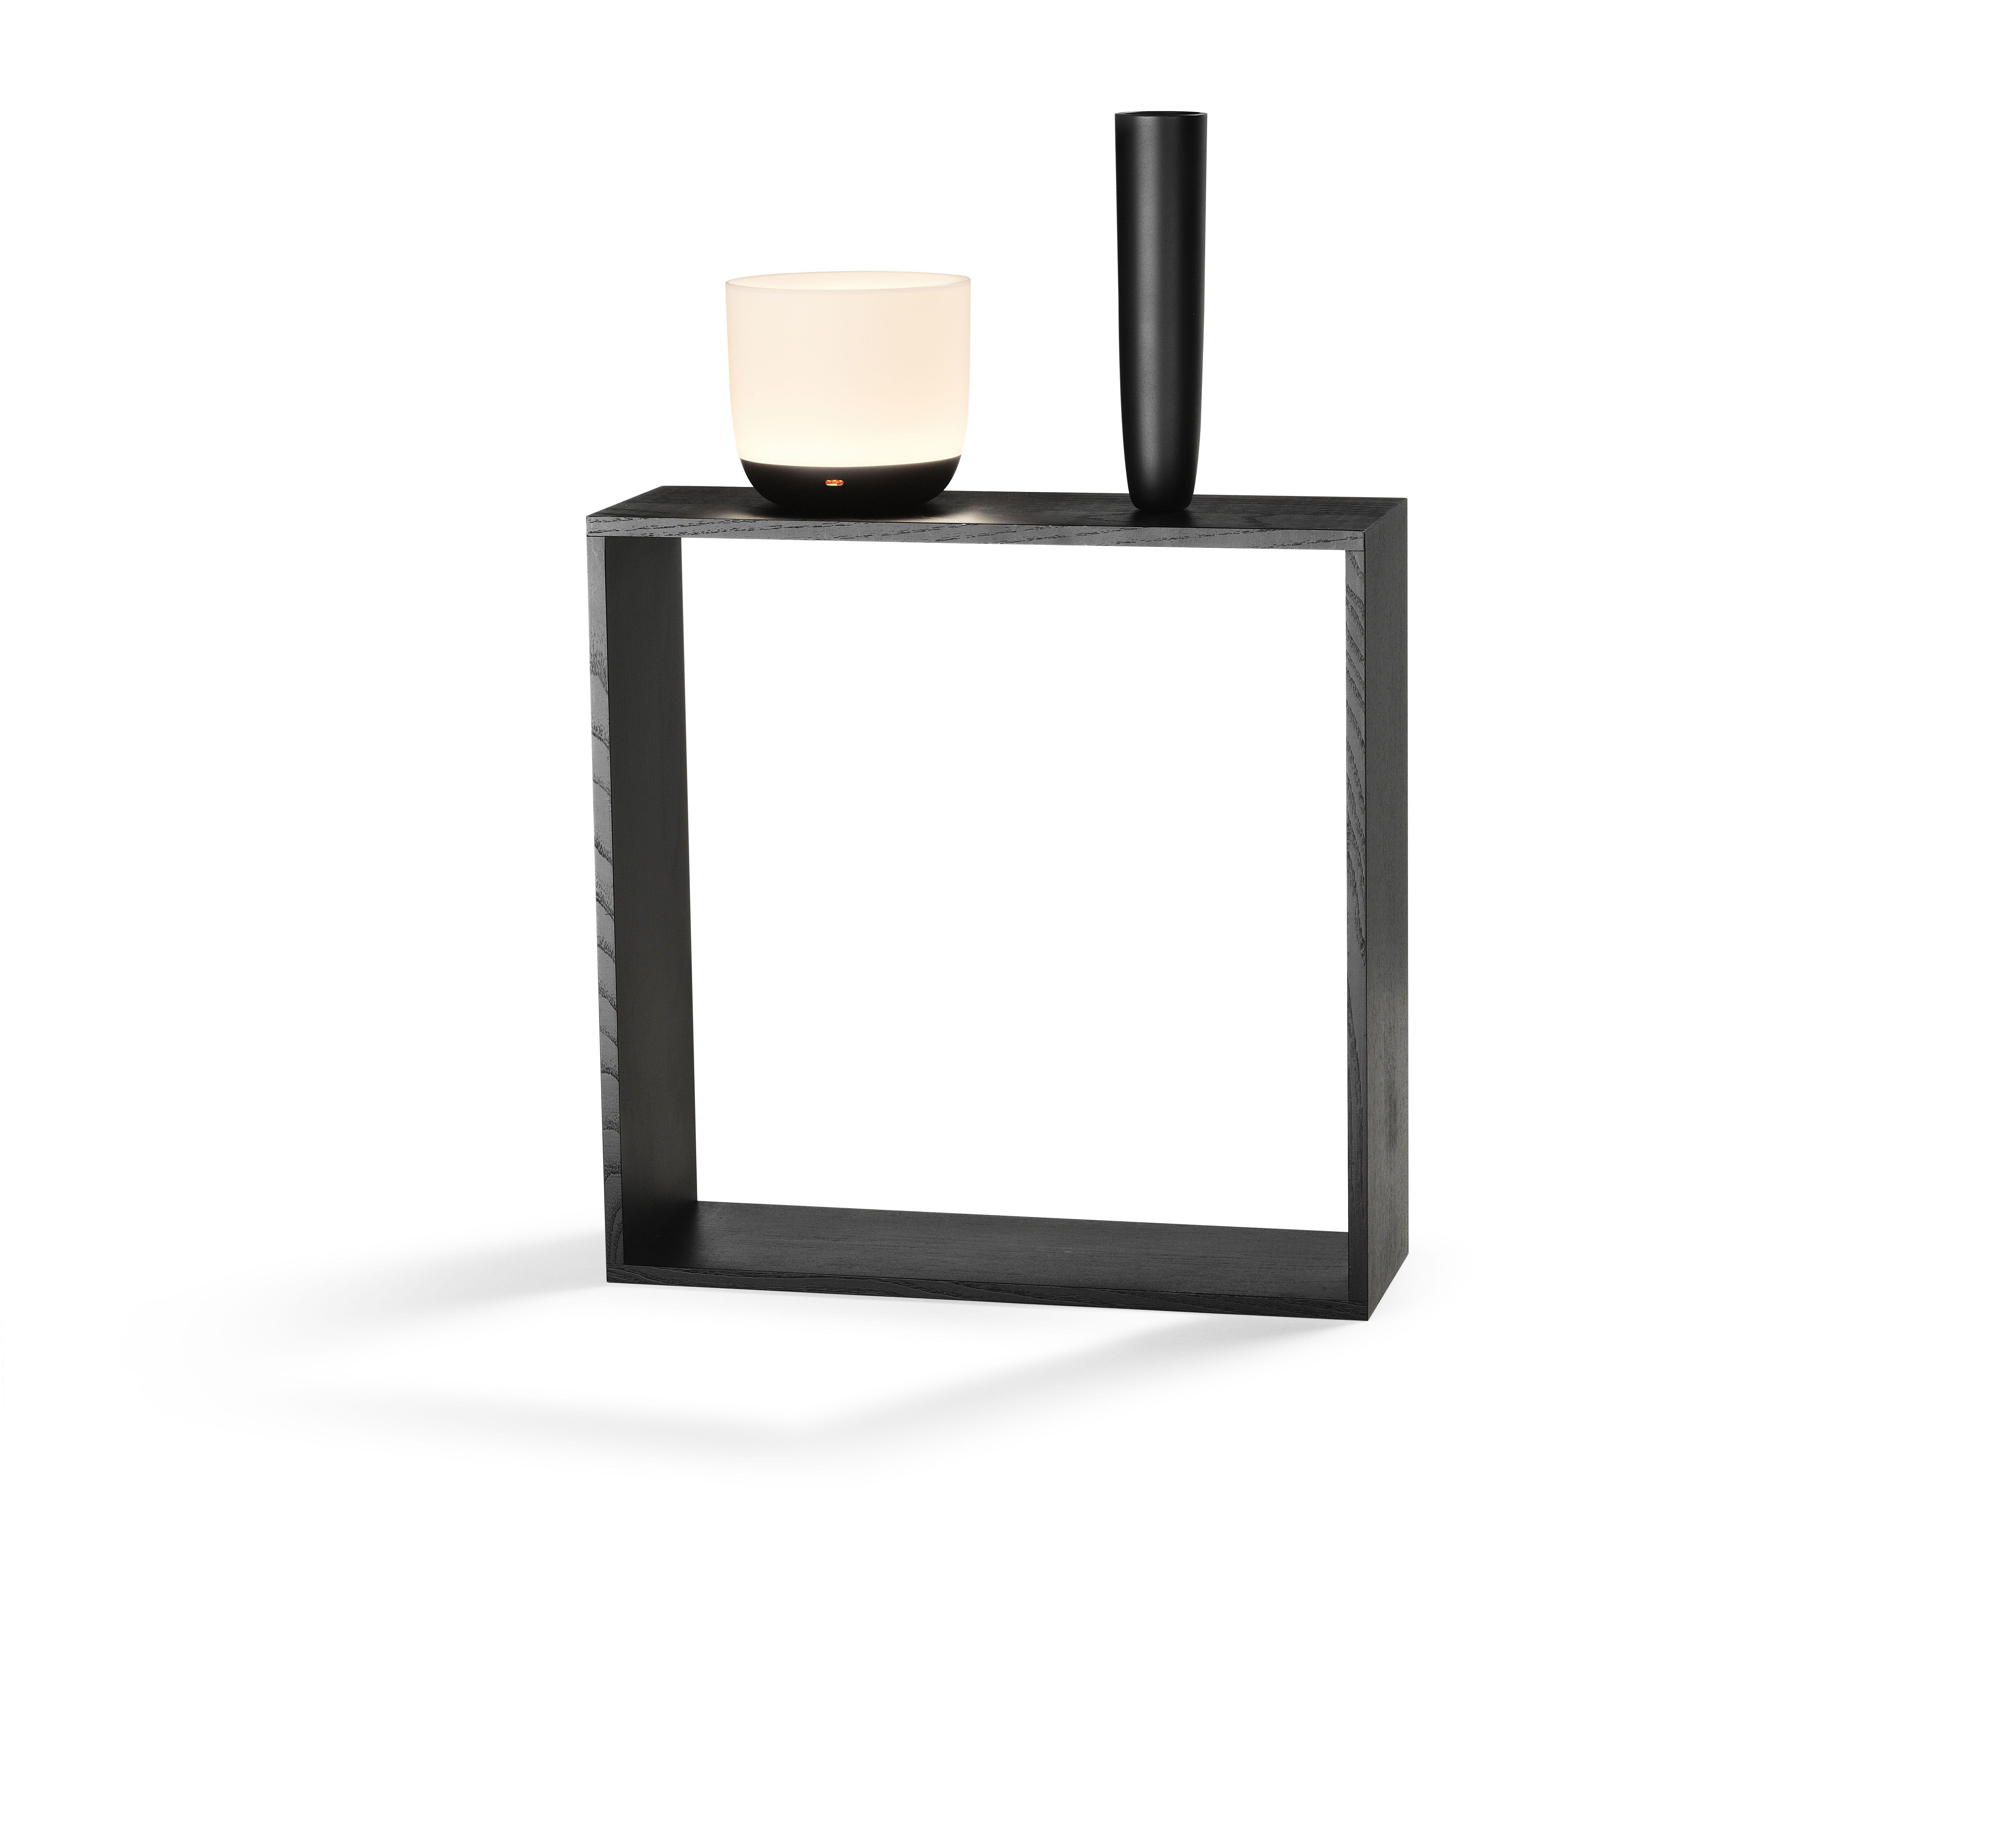 Gaku Wireless Lamp Table Flos Rechargeable Lamp Flos Table Lamp